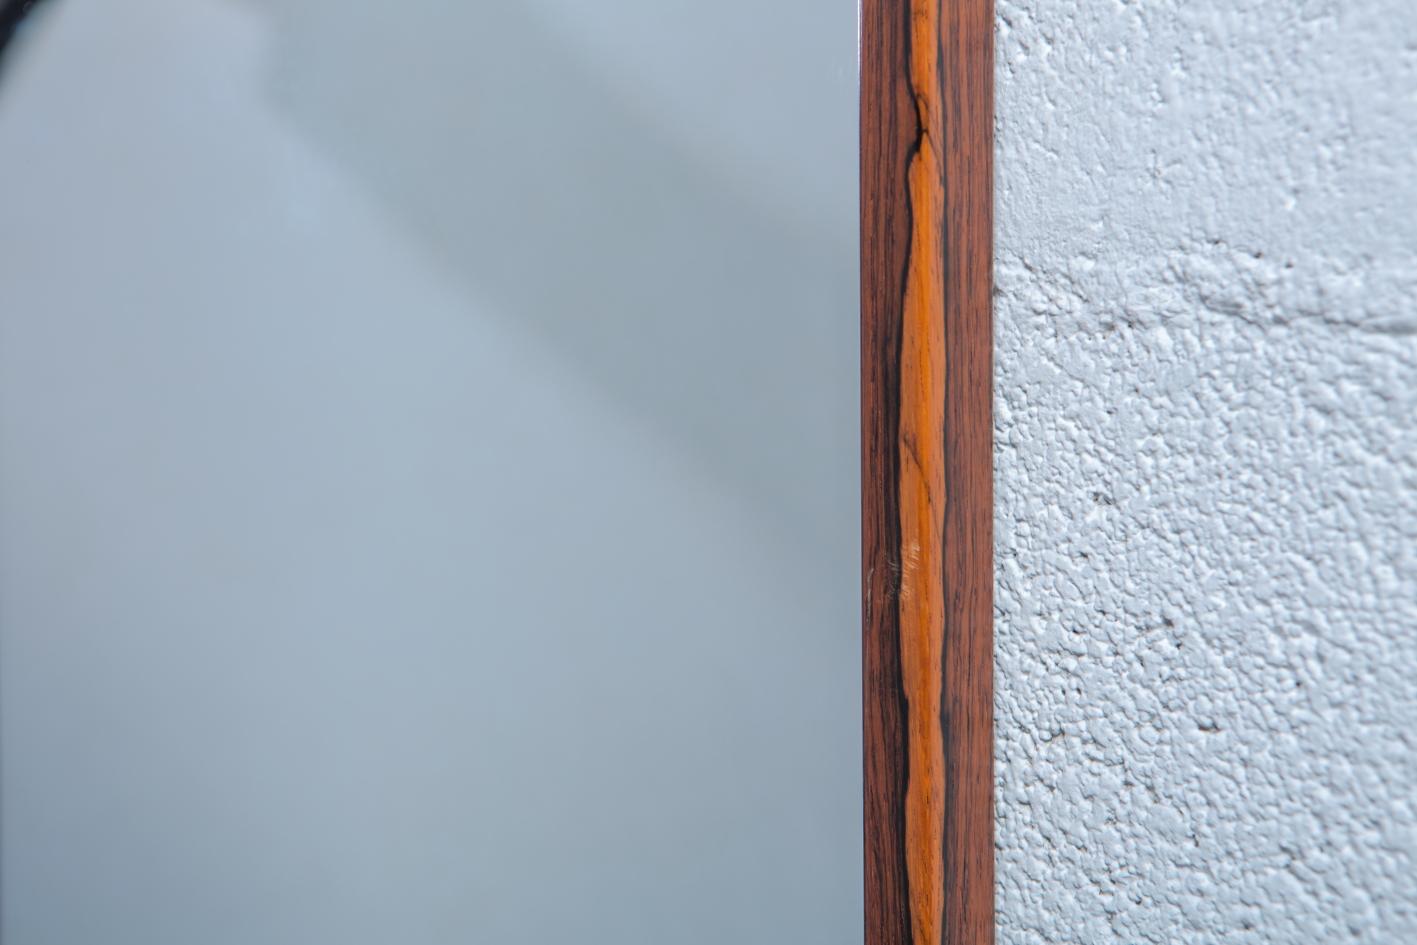 Rosewood Mirror by Uno & Östen Kristiansson for Luxus - Frame